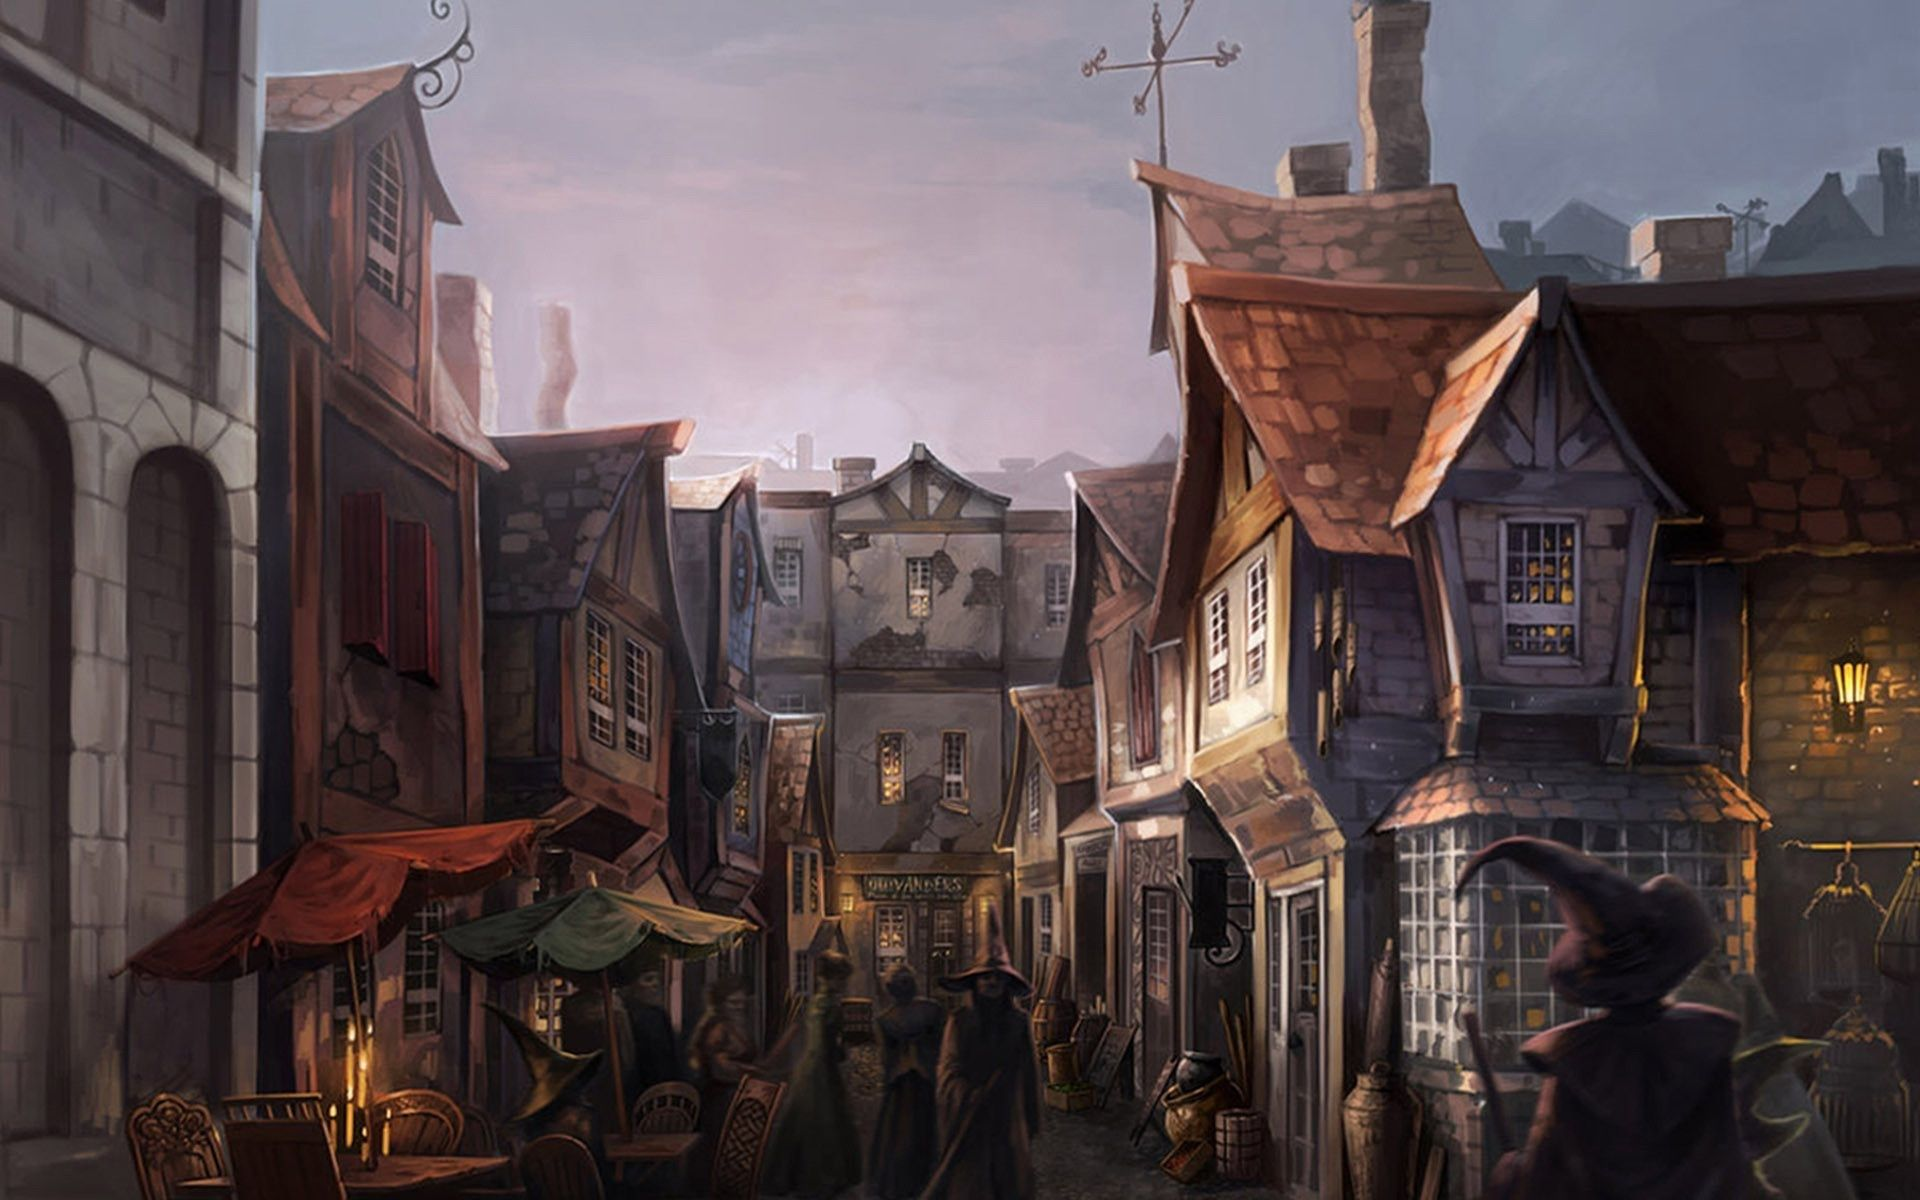 Most Inspiring Wallpaper Mac Harry Potter - ab400877fe3d24117ad68fc00d0718b5  Image_426263.jpg